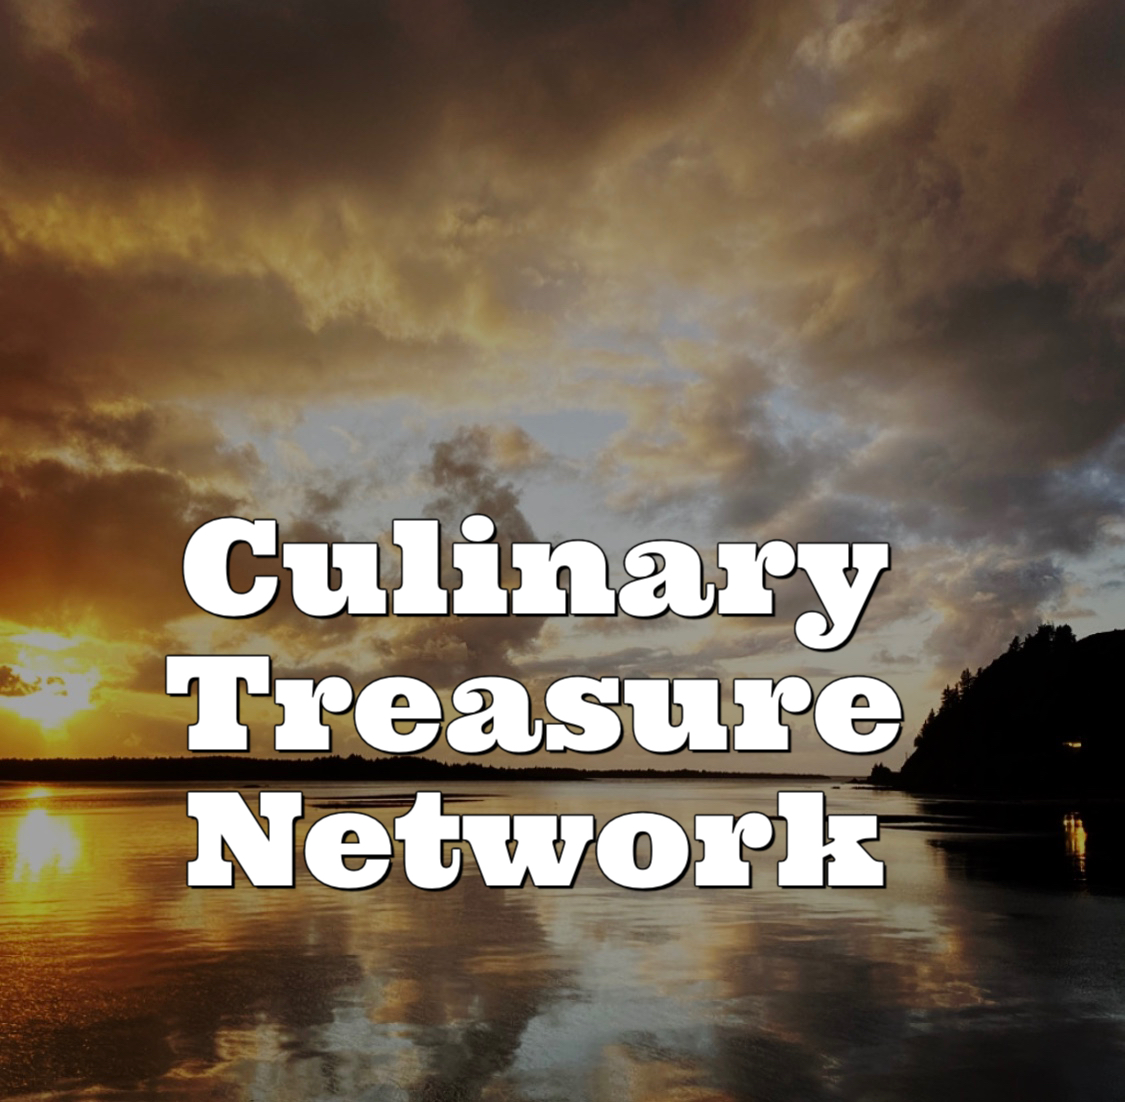 Culinary Treasure Network Steven Shomler